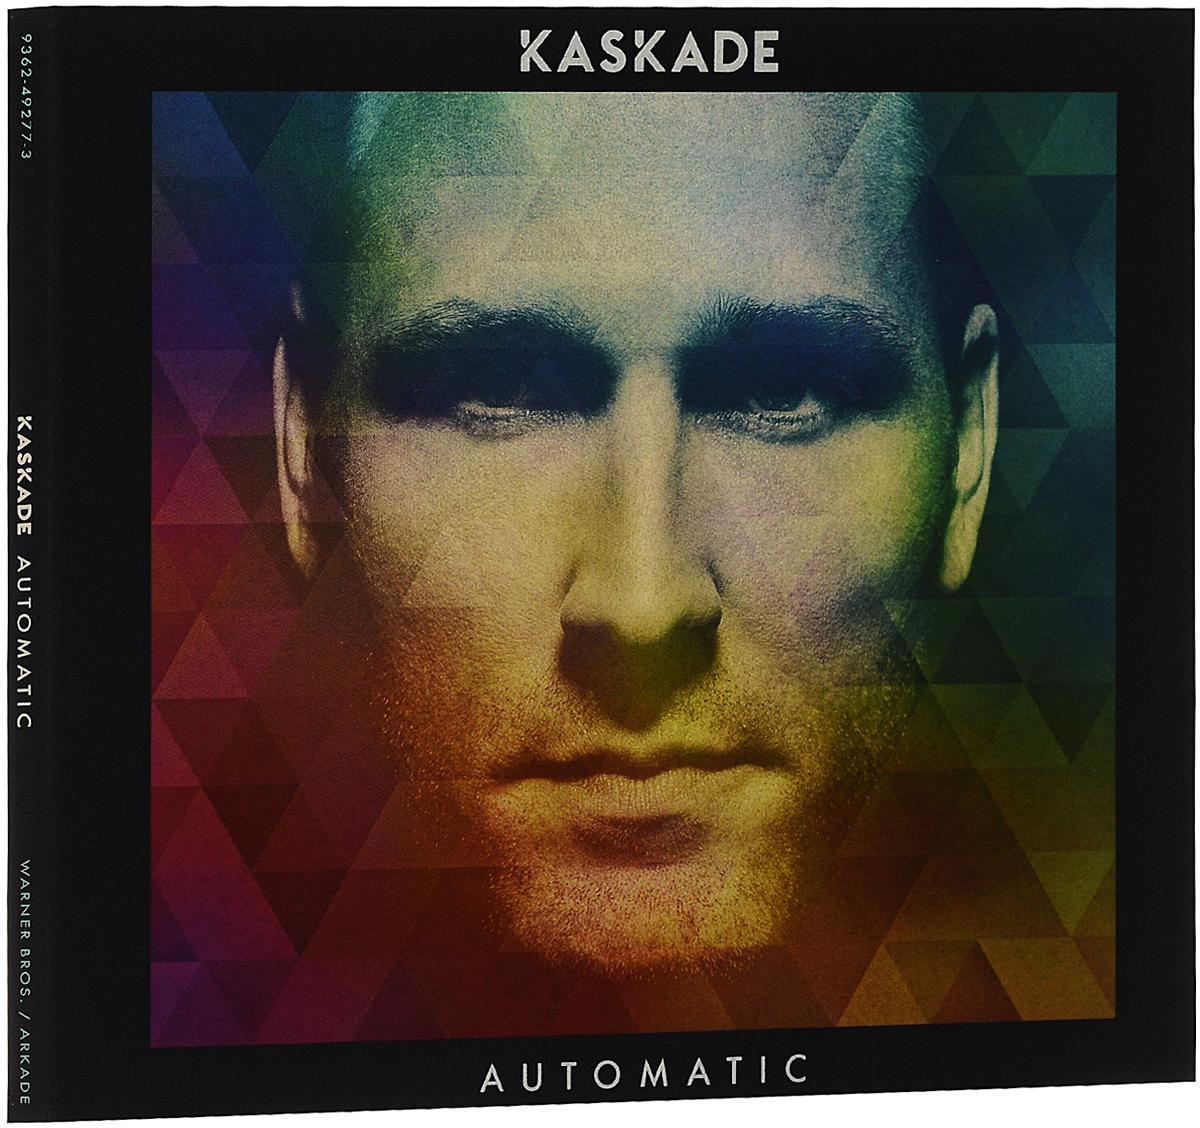 Kaskade. Automatic 2015 Audio CD